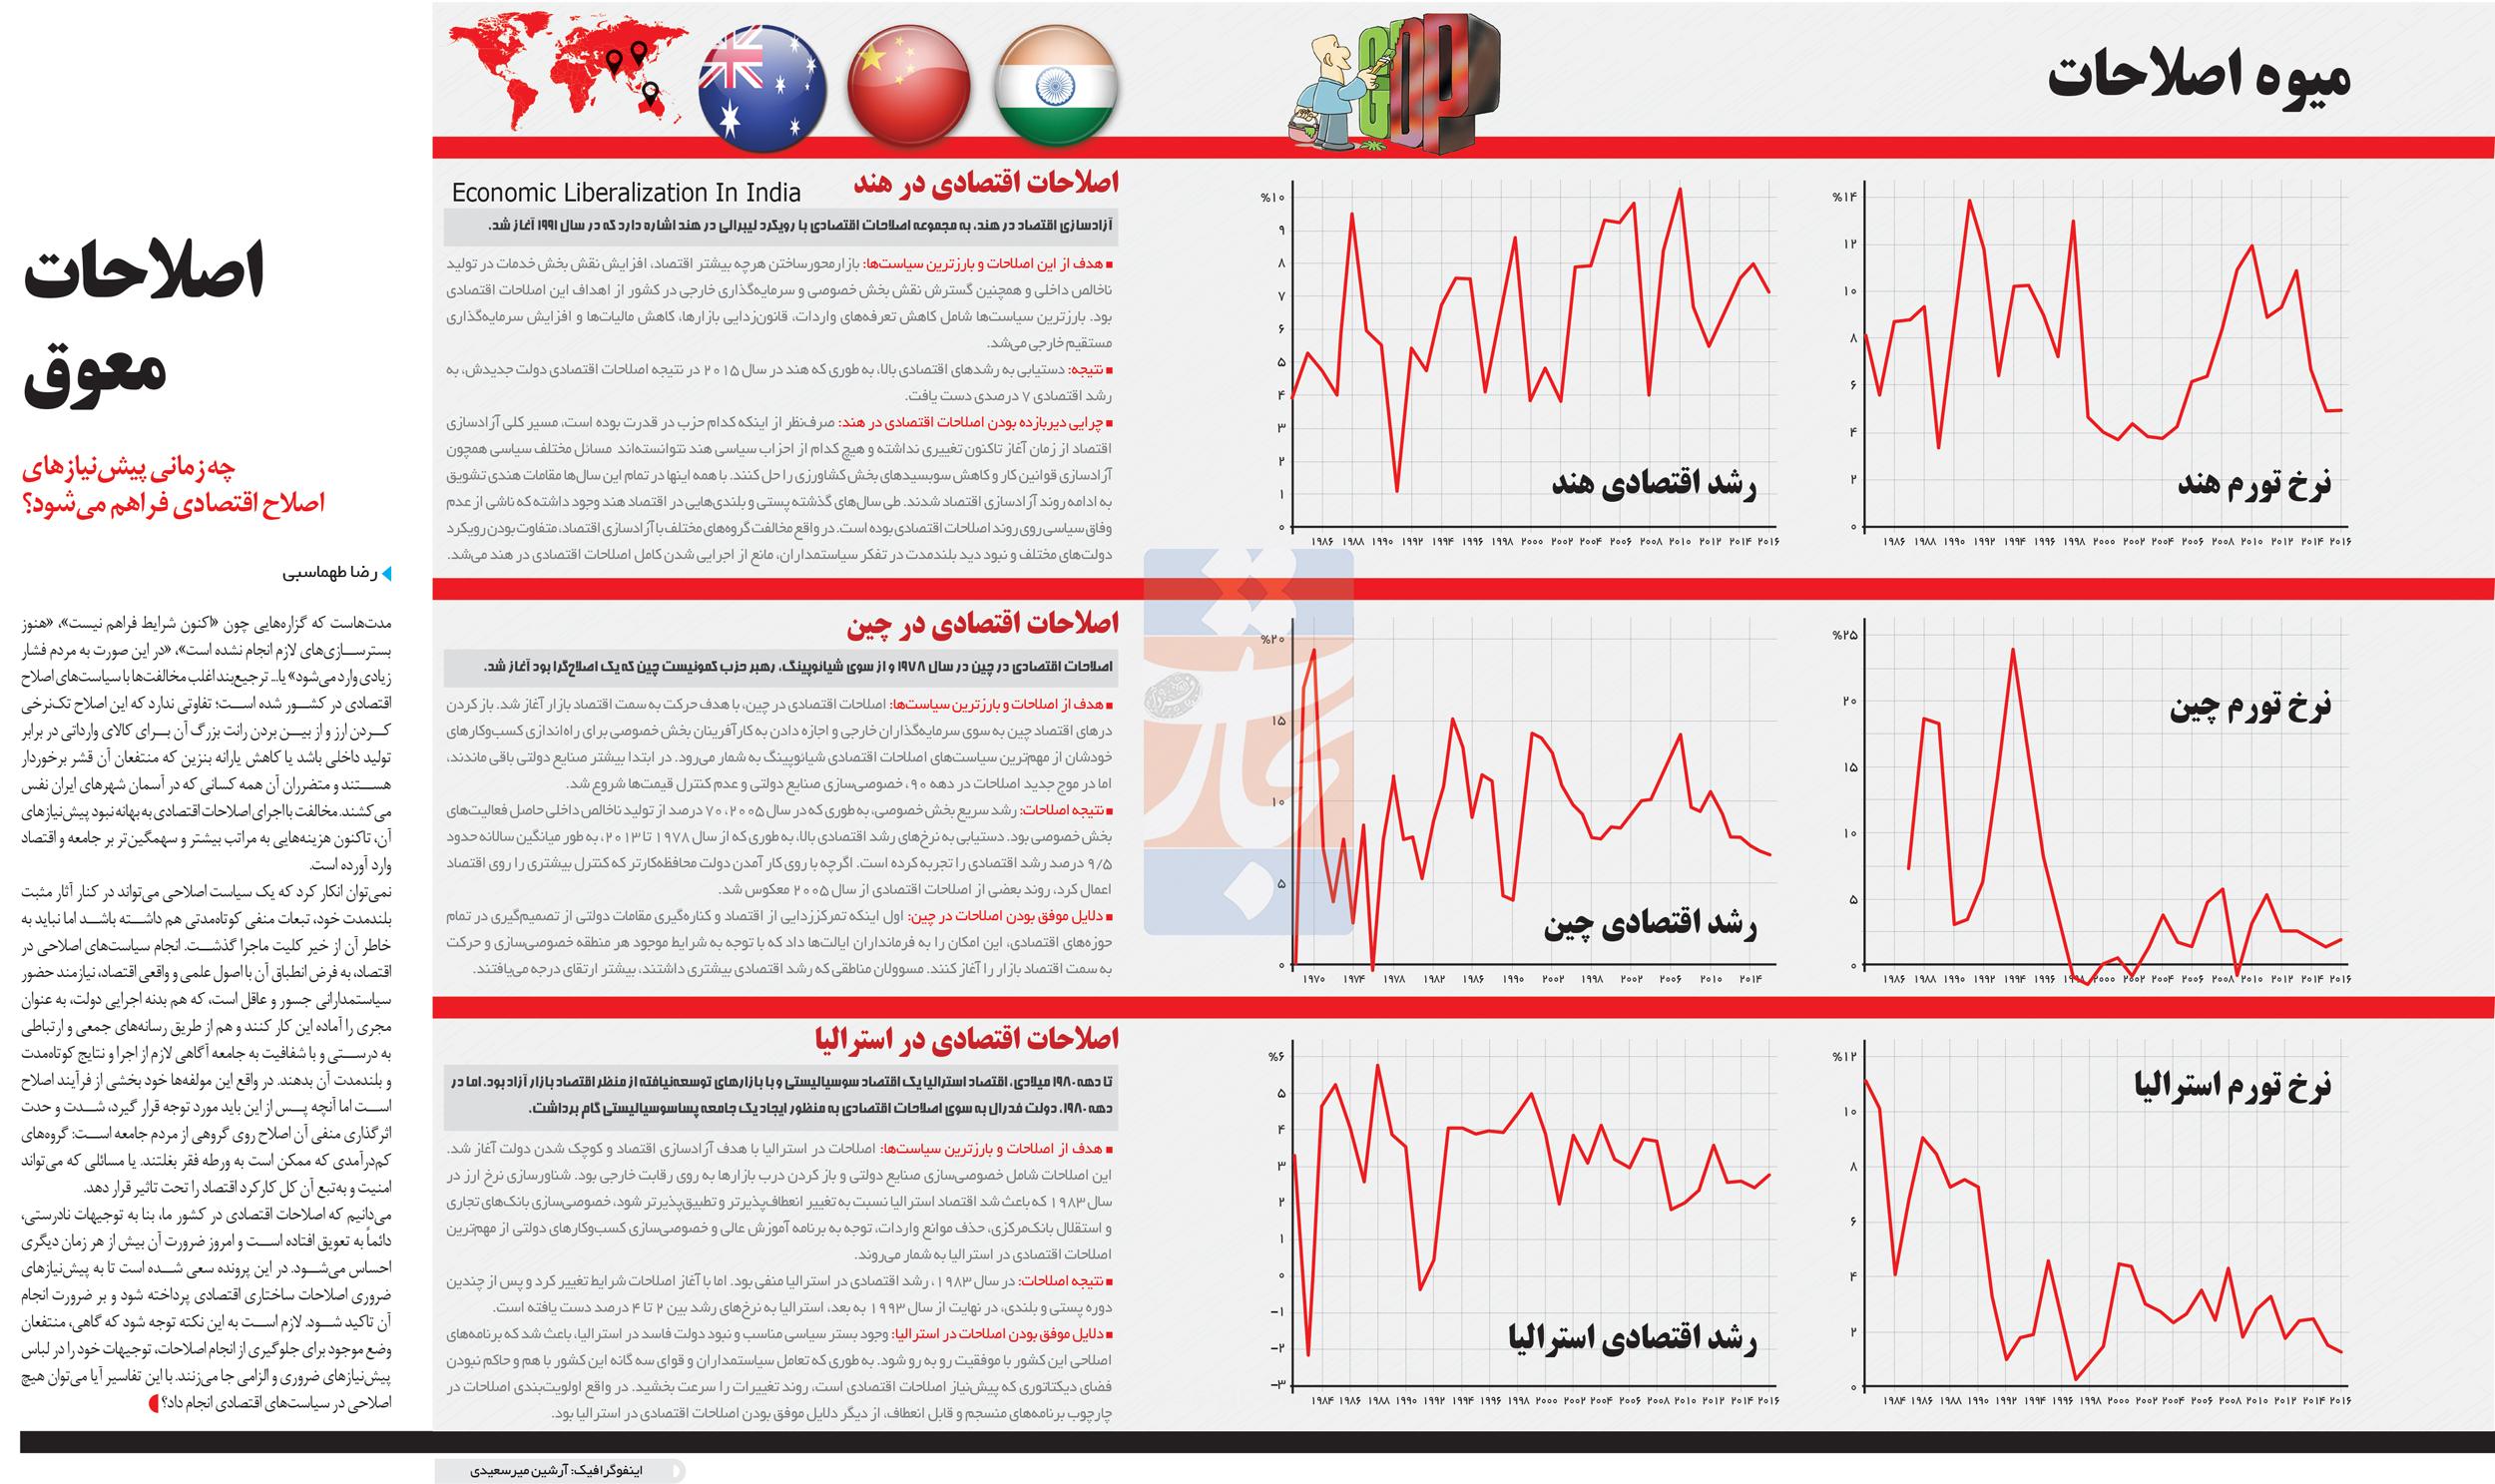 تجارت- فردا- میوه اصلاحات(اینفوگرافیک)